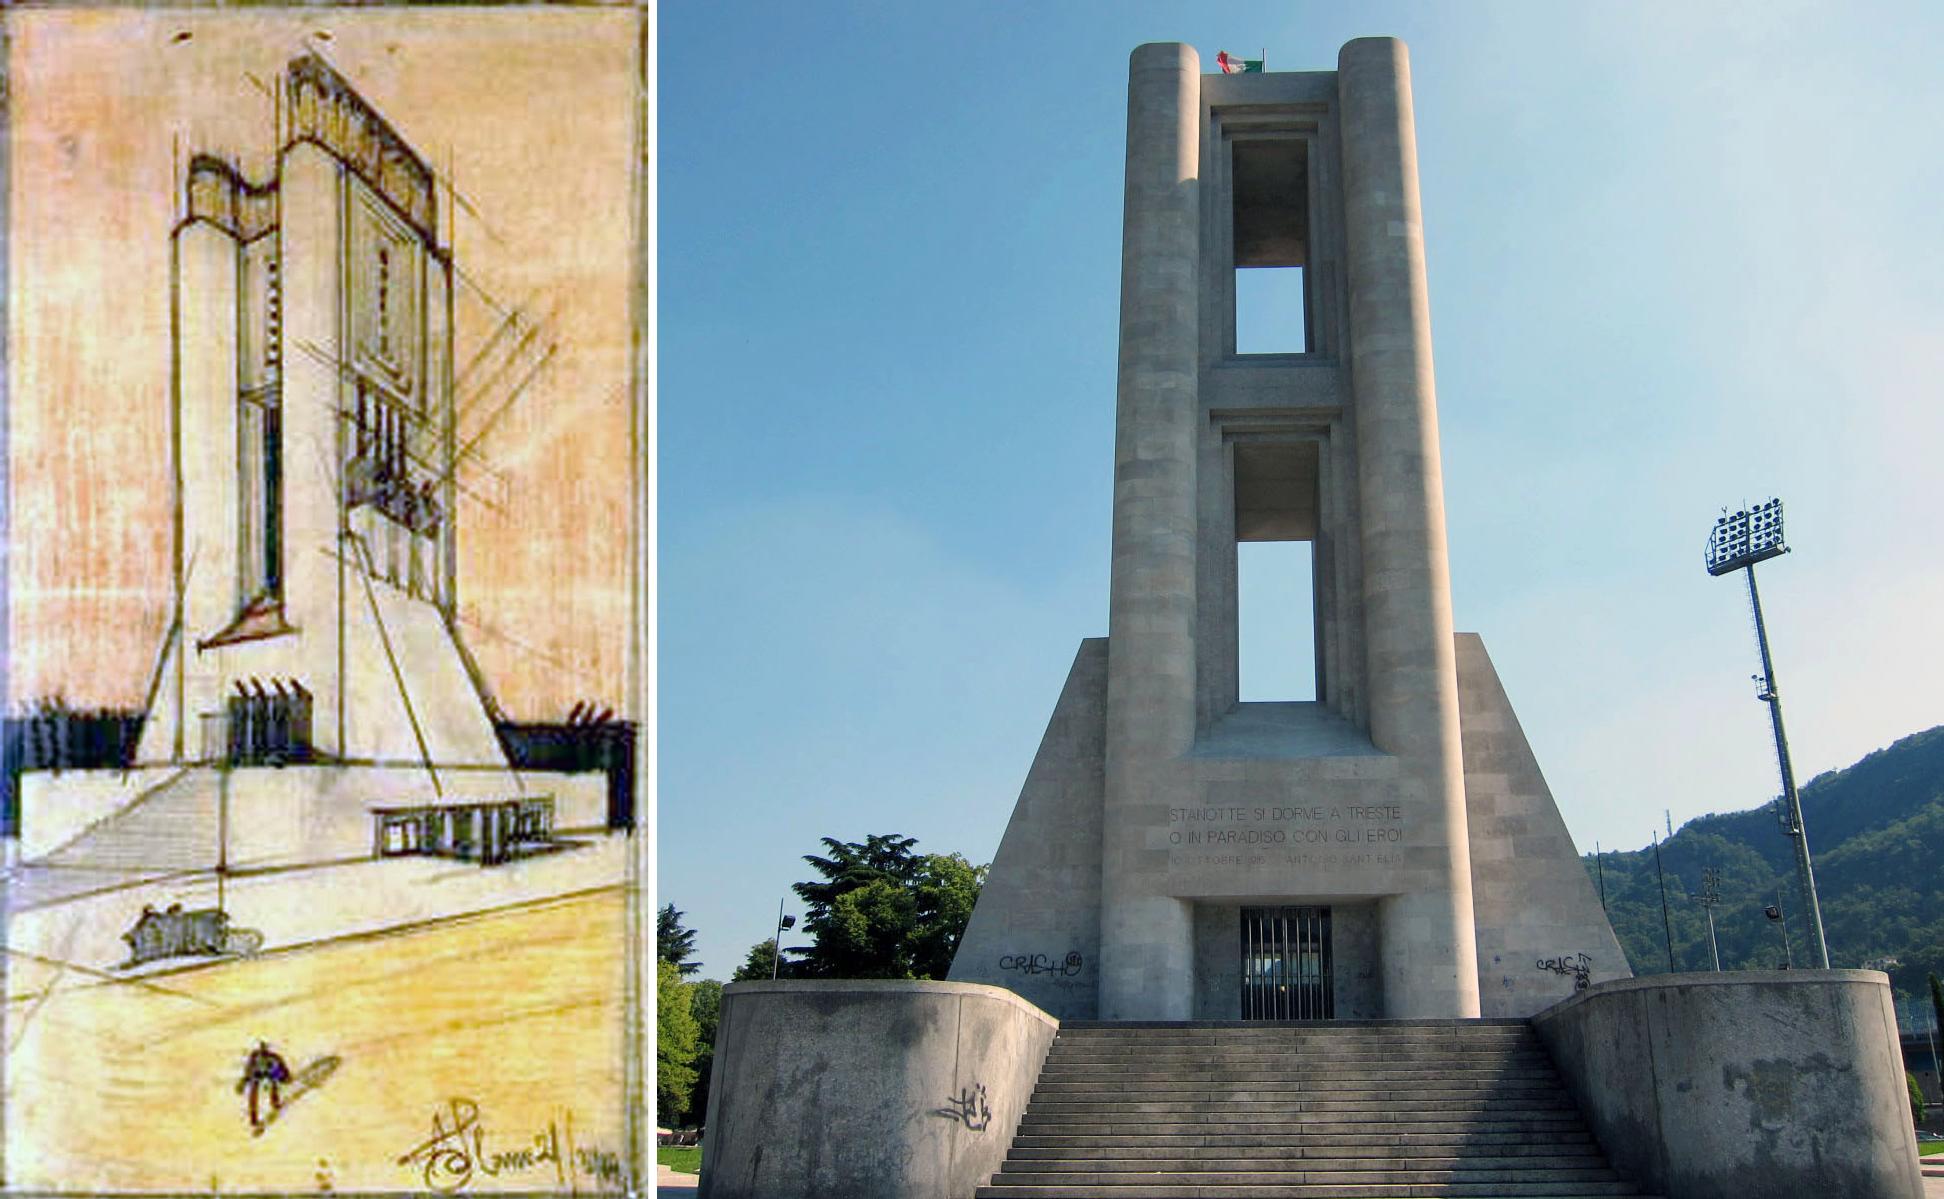 Mussolini'nin İzinde Roma Mimarisi | Terragni Kardeşler